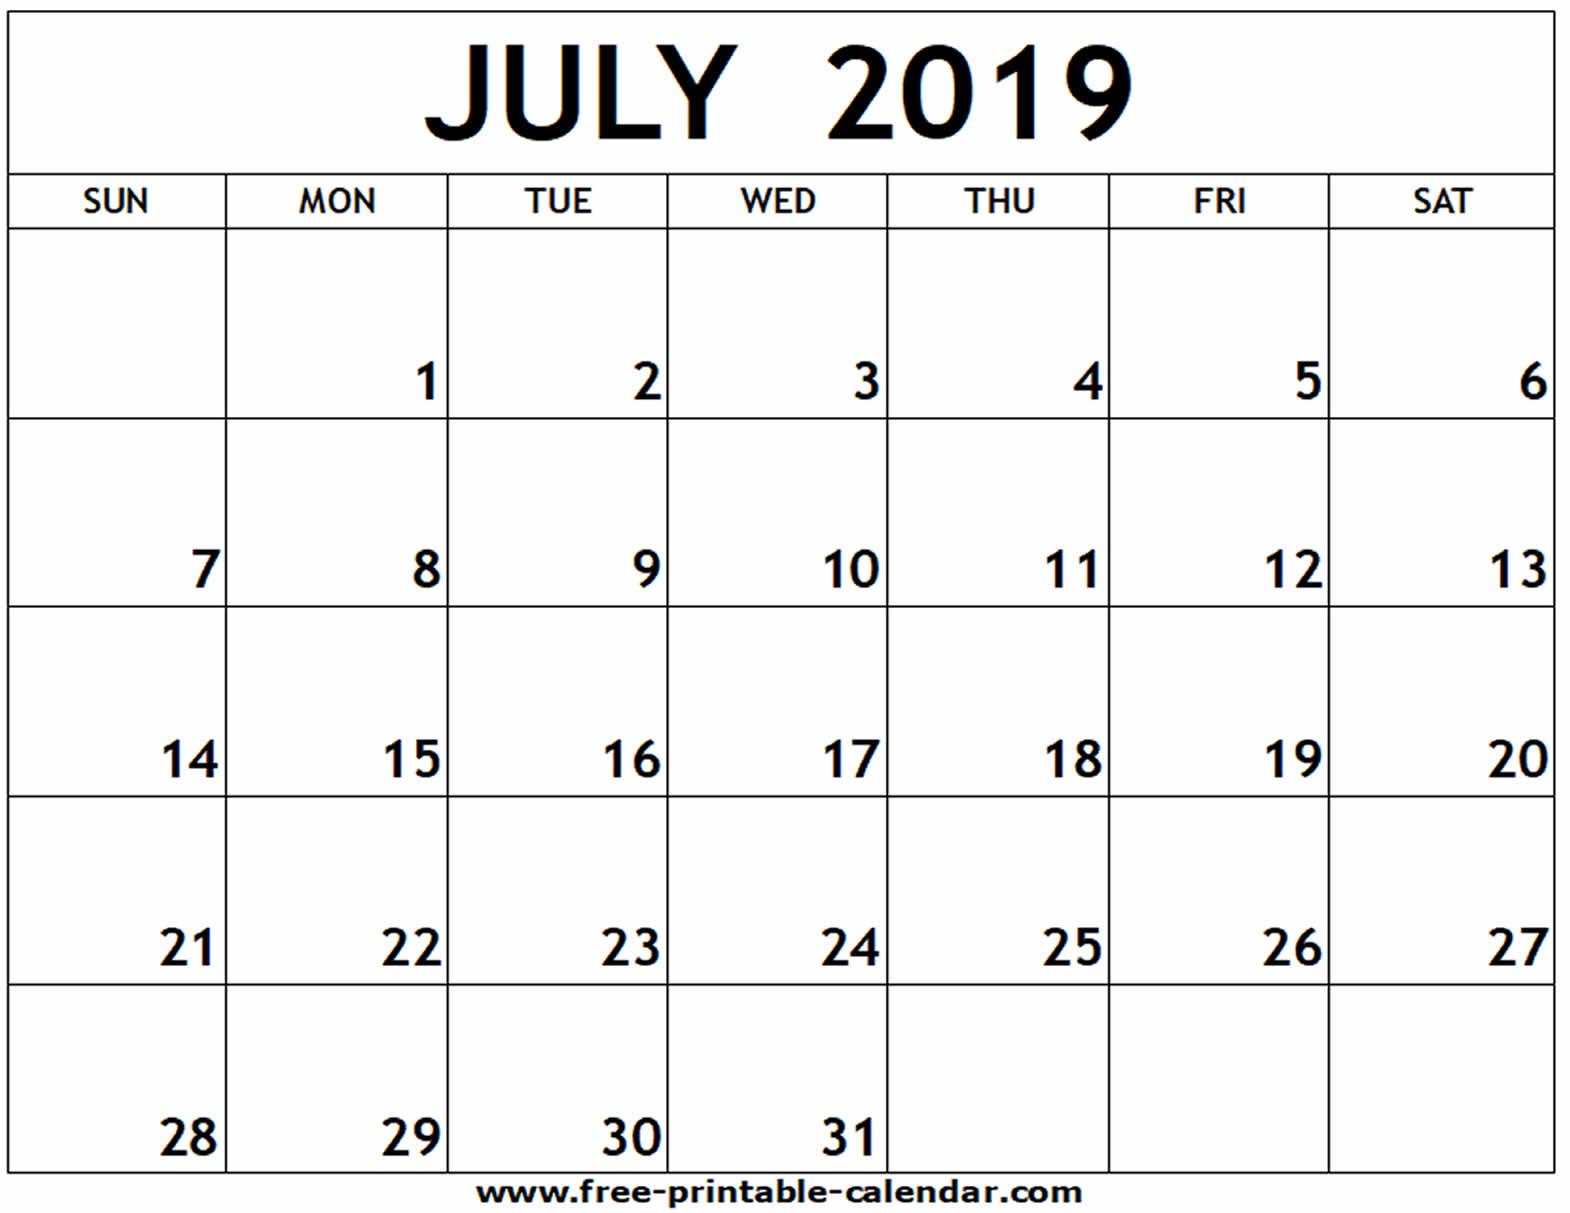 July 2019 Printable Calendar - Free-Printable-Calendar